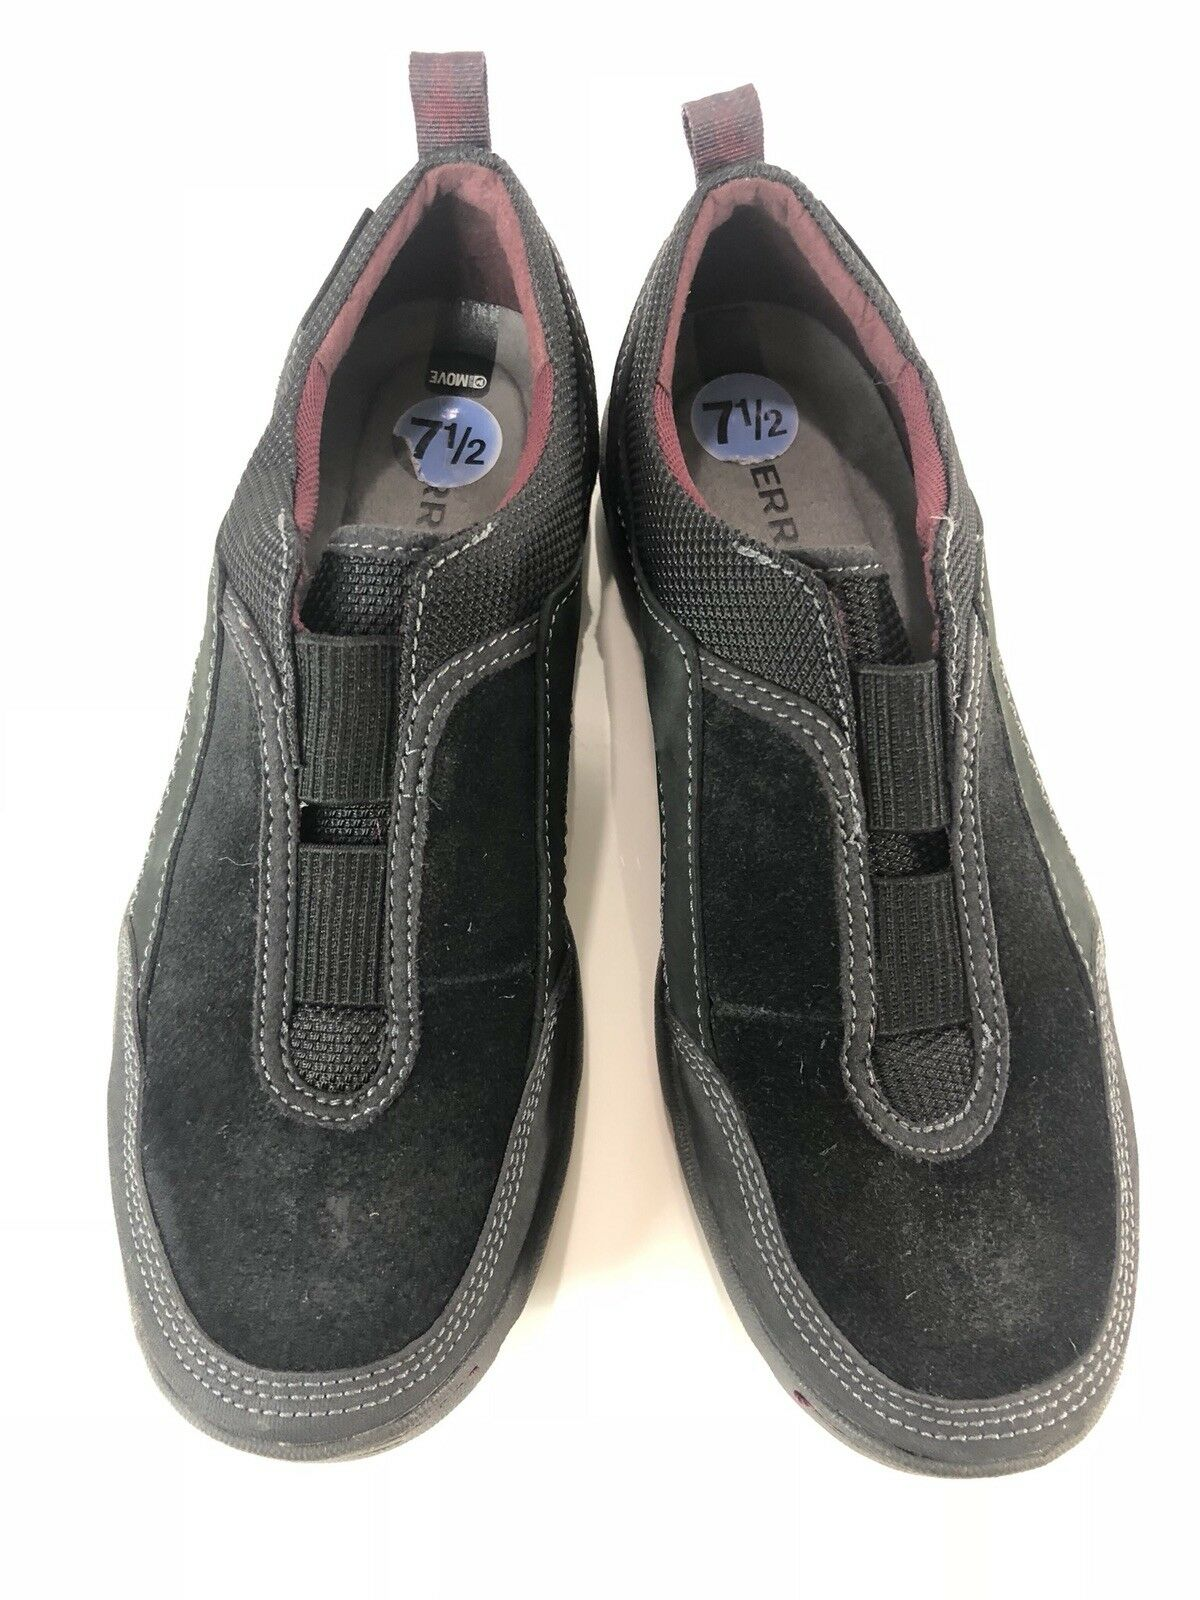 Merrell Select Mimosa J48586 Womens Black Slip On shoes Size 7.5